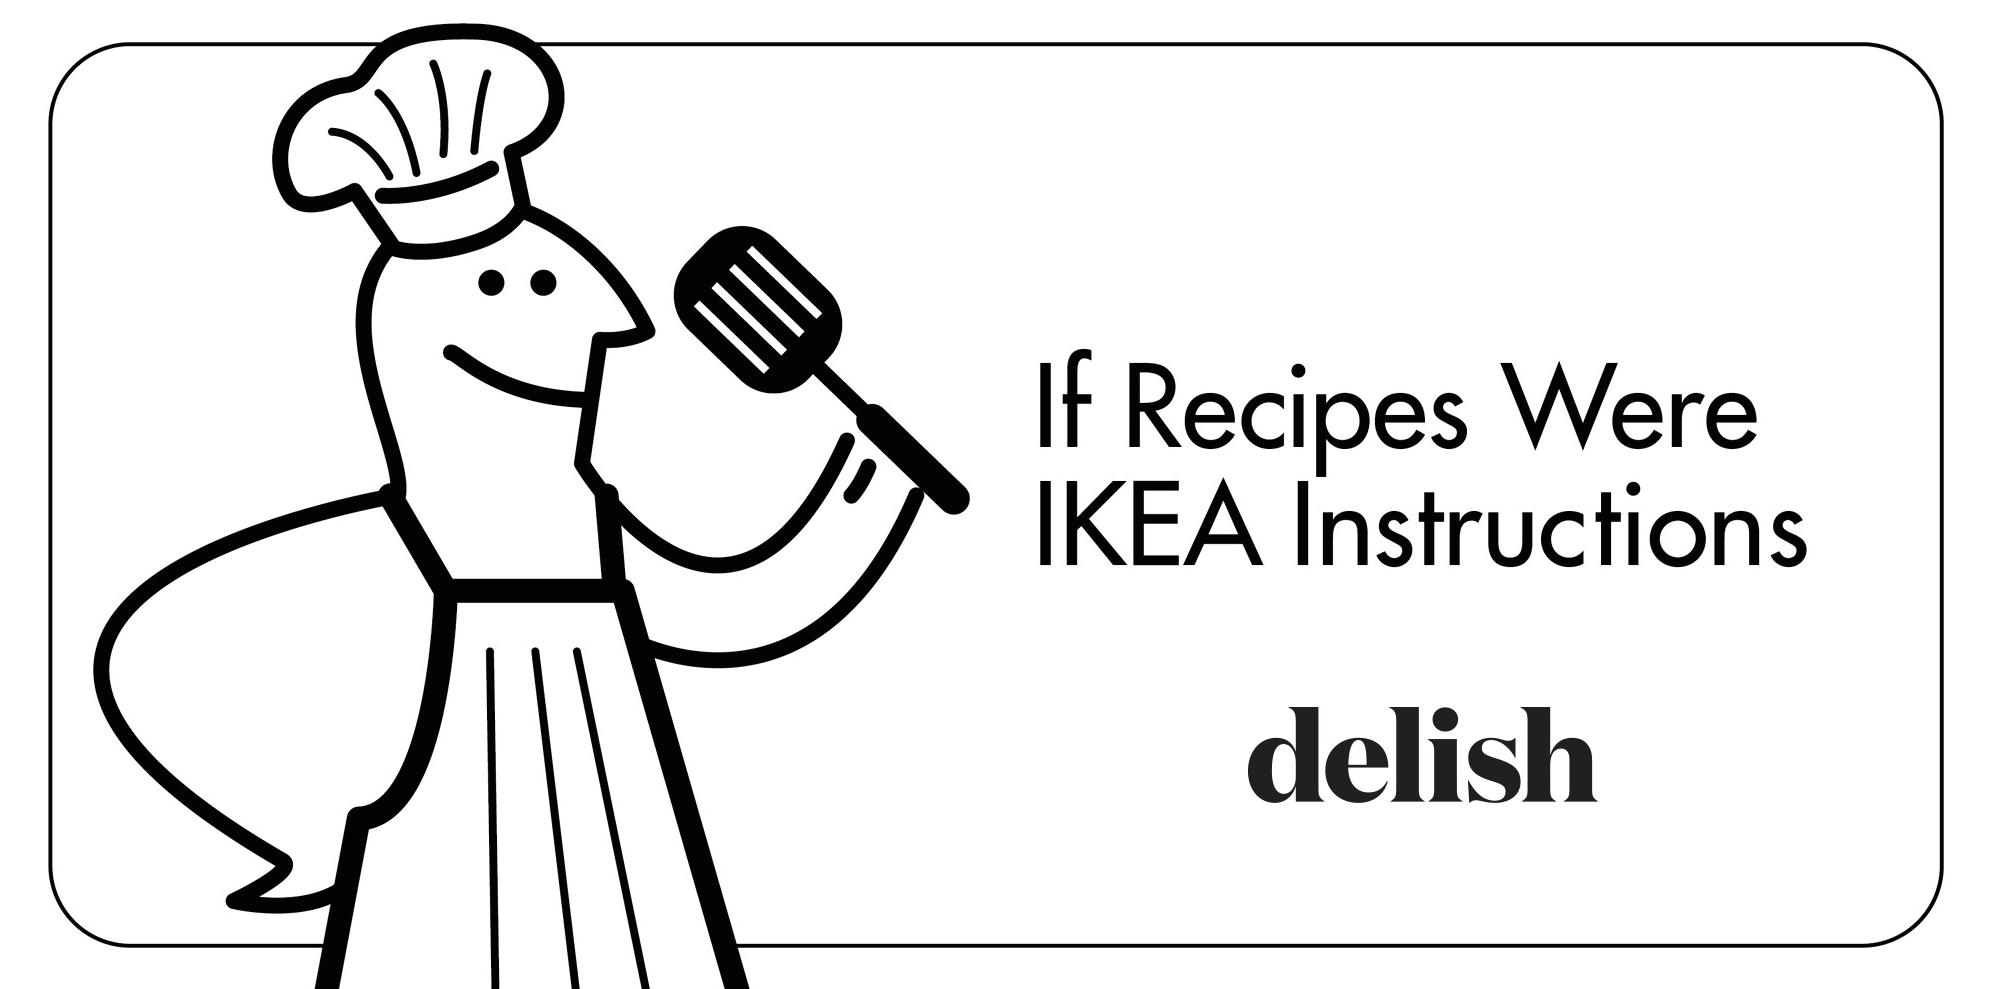 1436564662-delish-recipes-ikea-instructions-lead.png